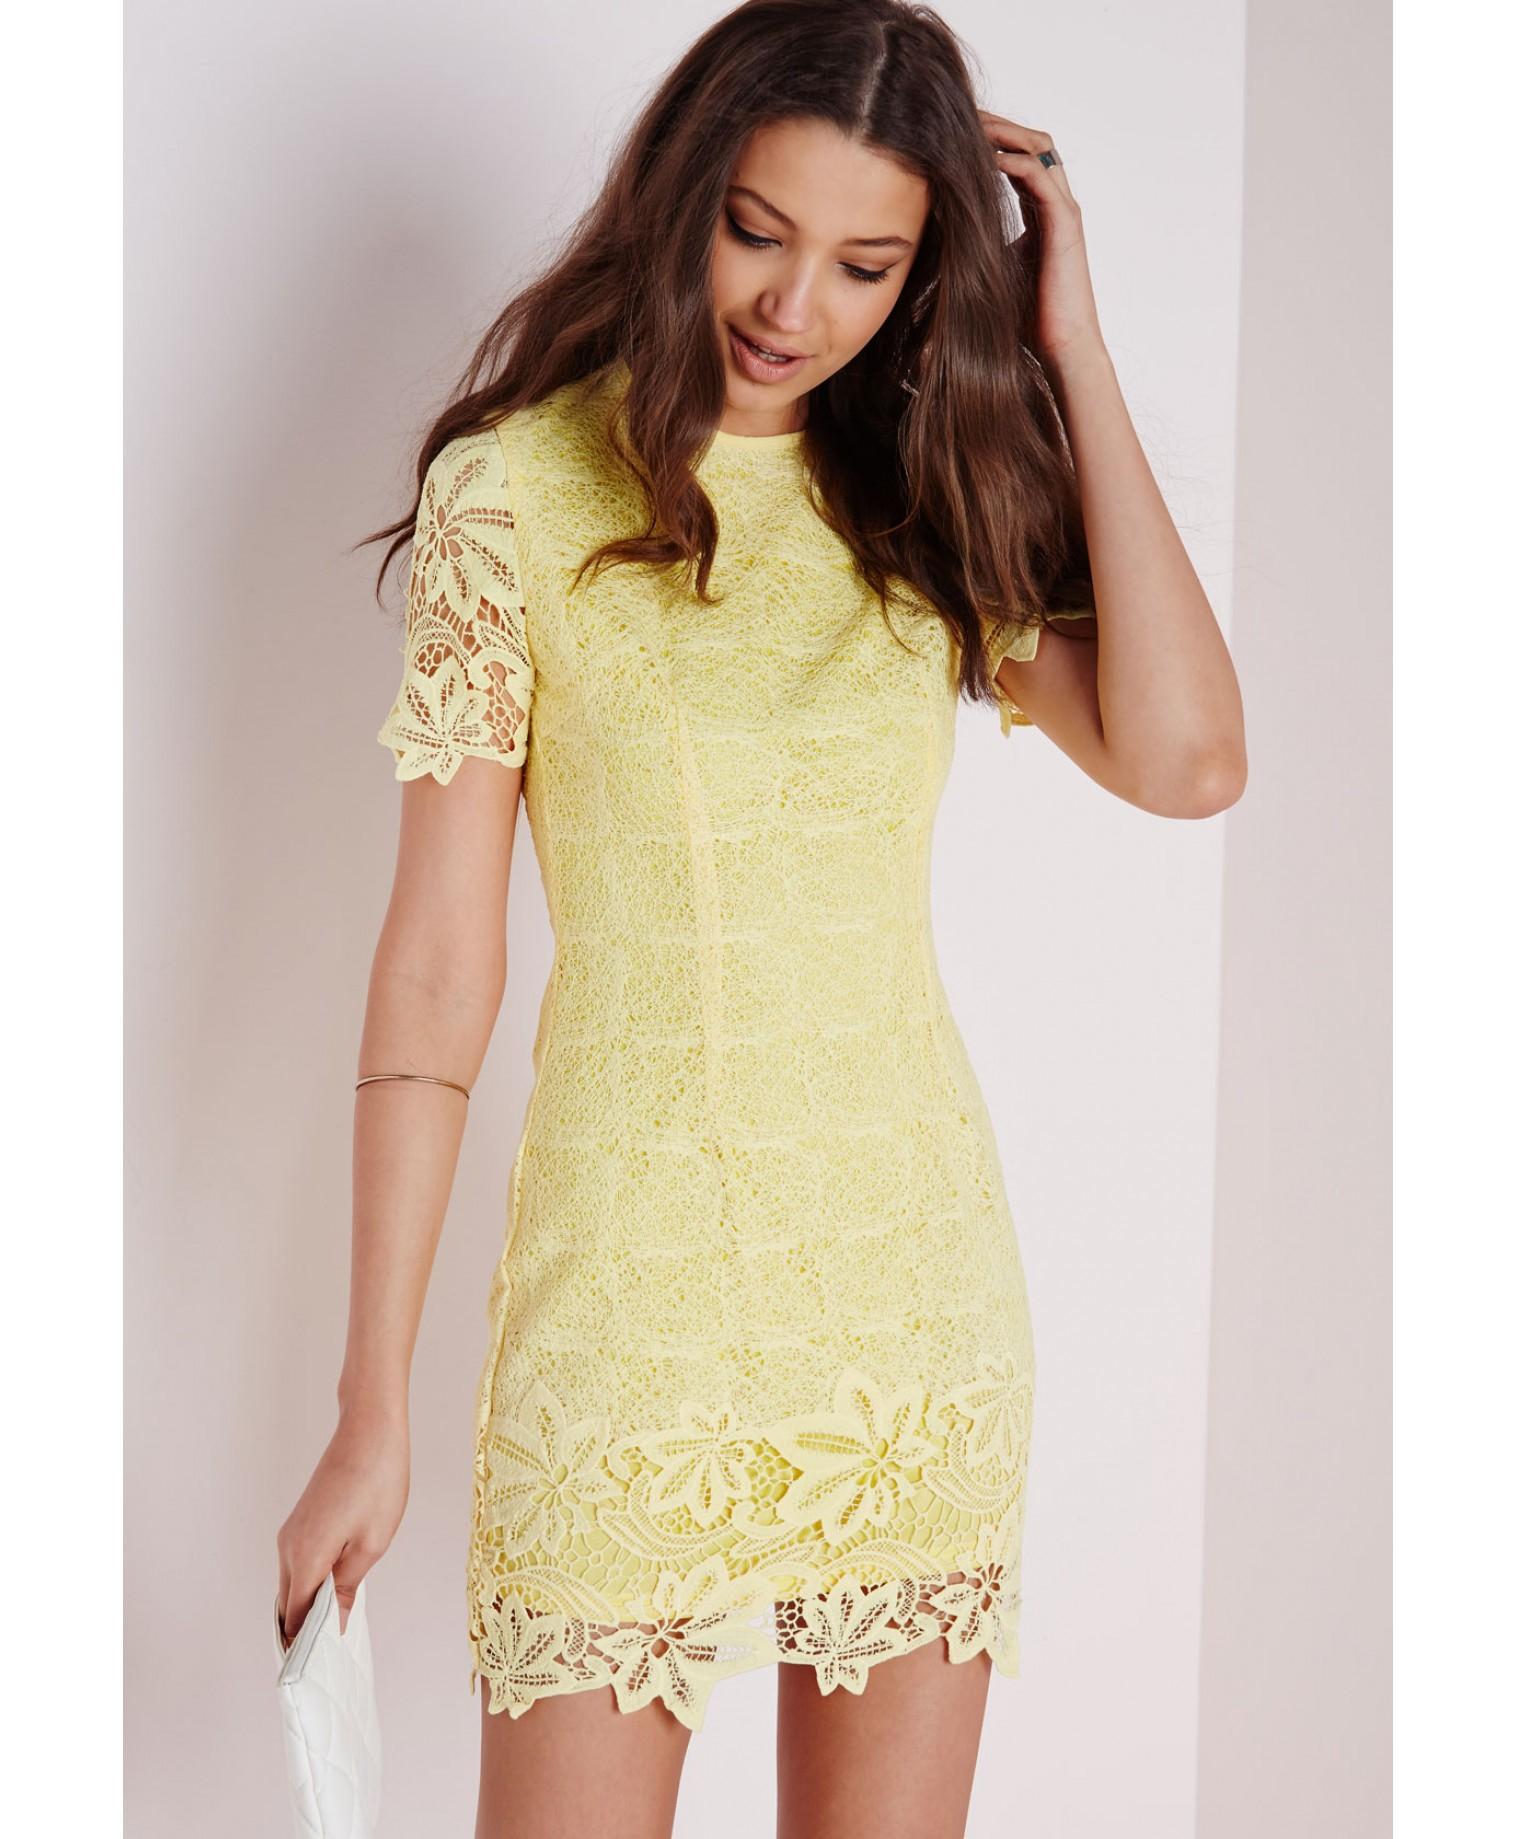 Debenhams with yellow bodycon dress uk charleston